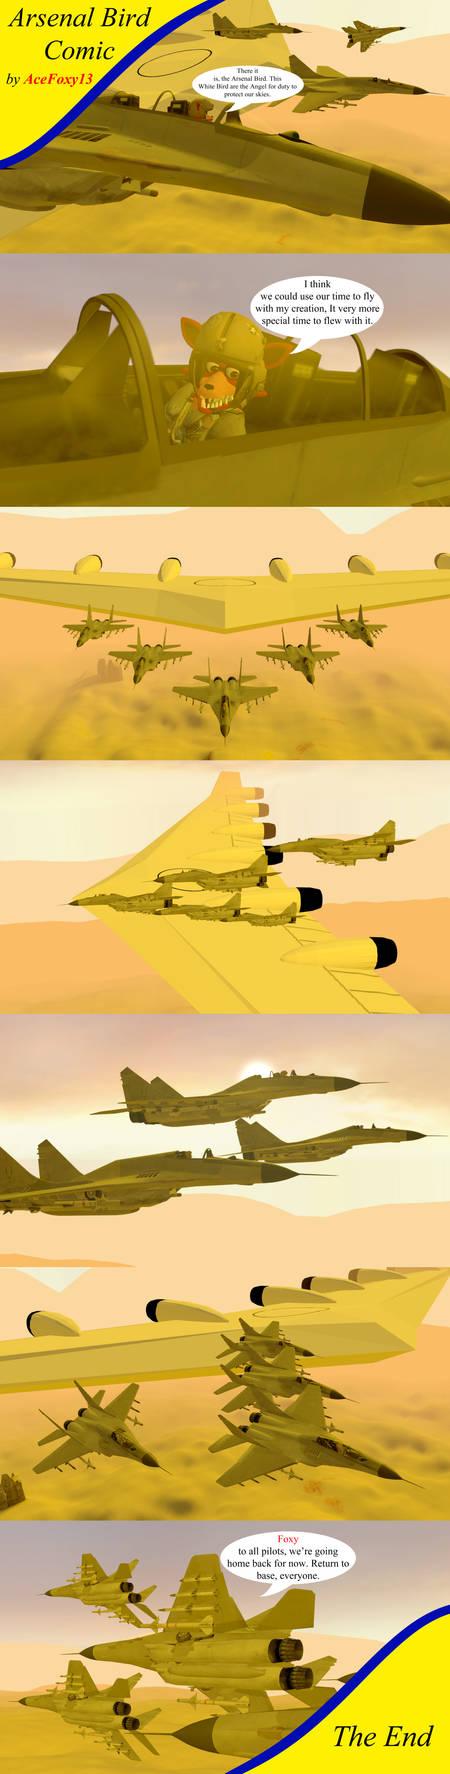 Arsenal Bird Comic By Acefoxy13 On Deviantart